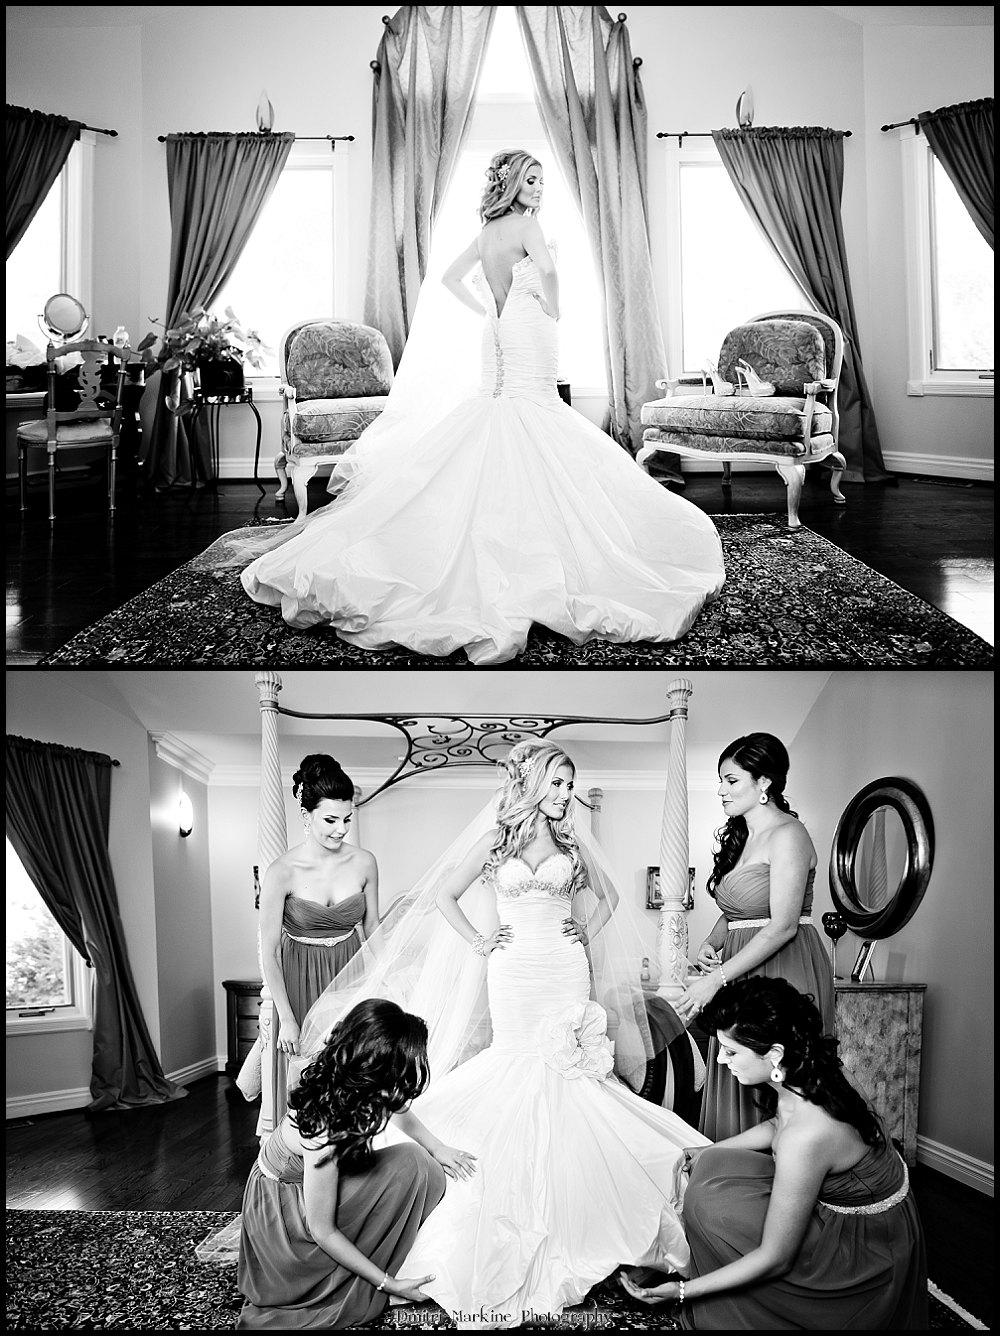 monique lhuillier wedding bridesmaid dress